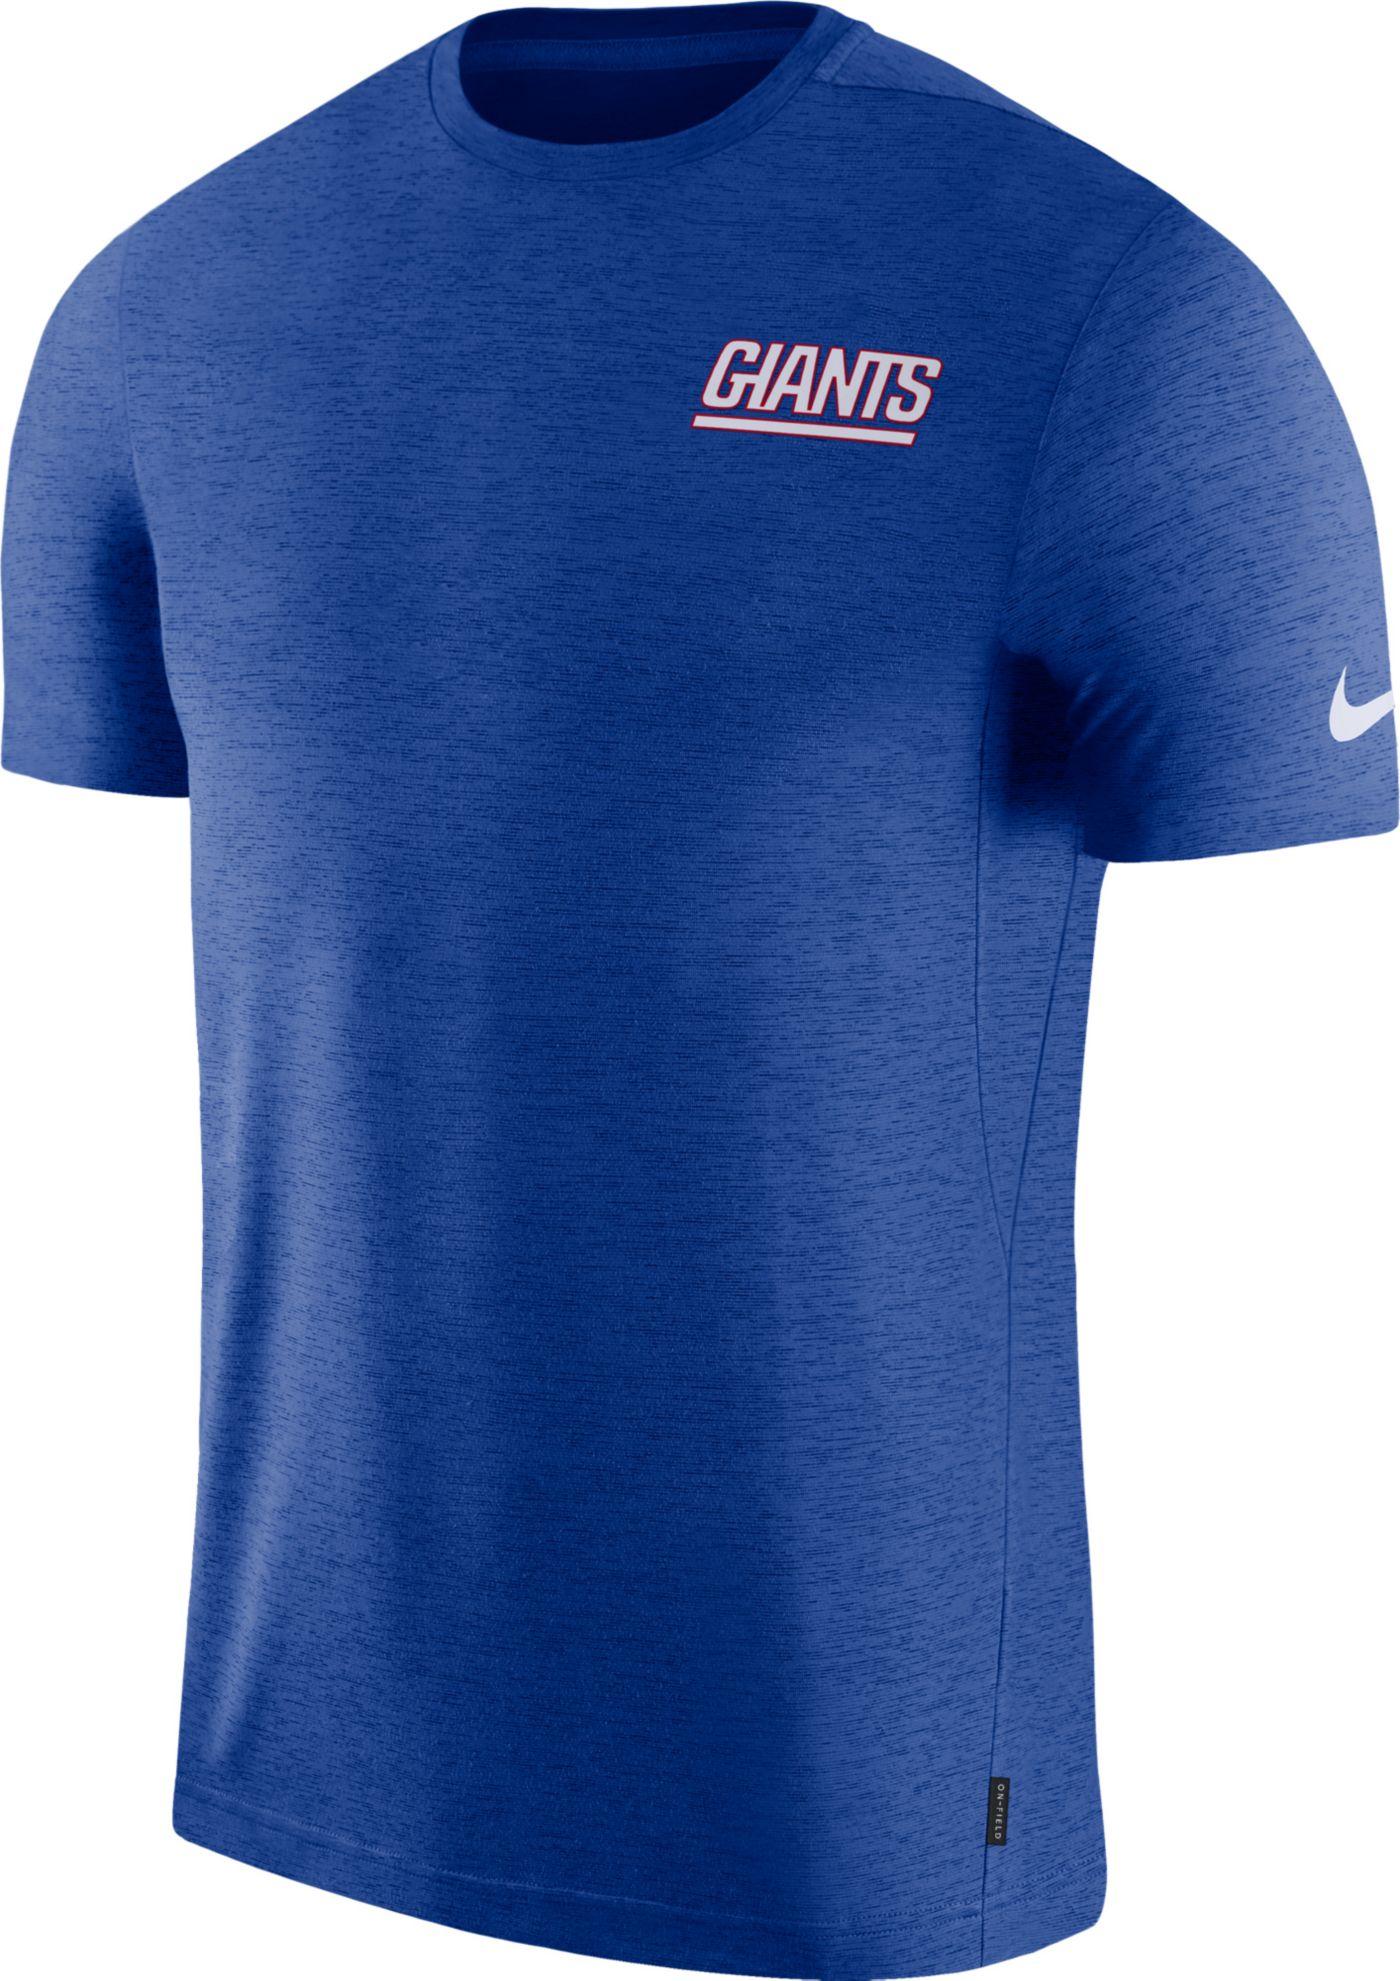 Nike Men's New York Giants Sideline Coach Performance Blue T-Shirt